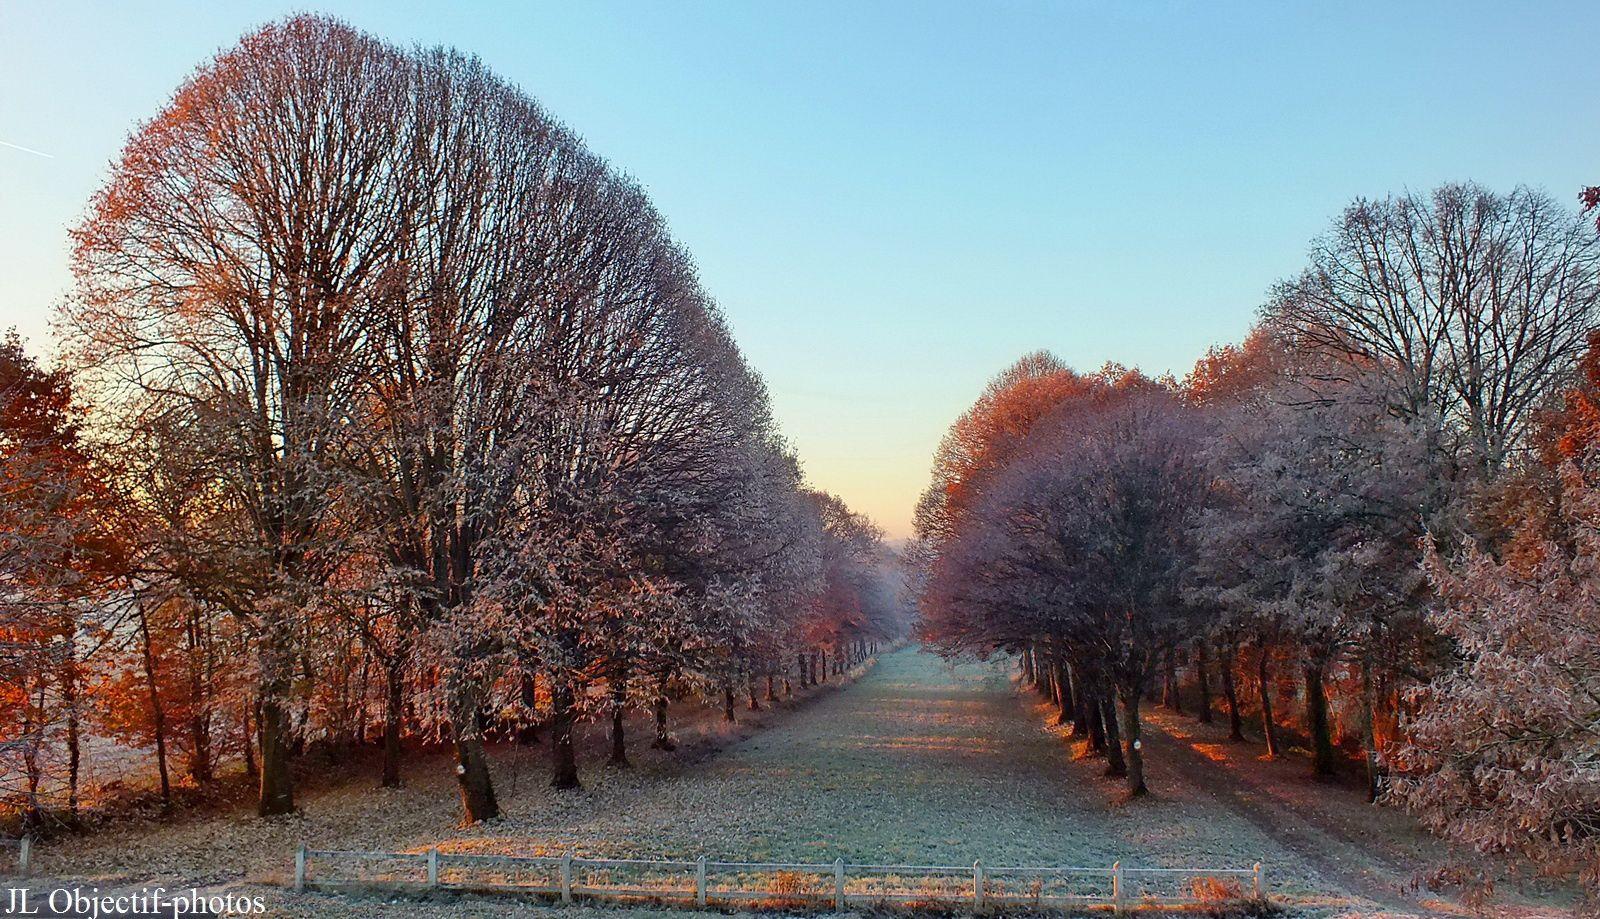 Allée de tilleuls dans la gelée du matin - Lime trees in the morning frost